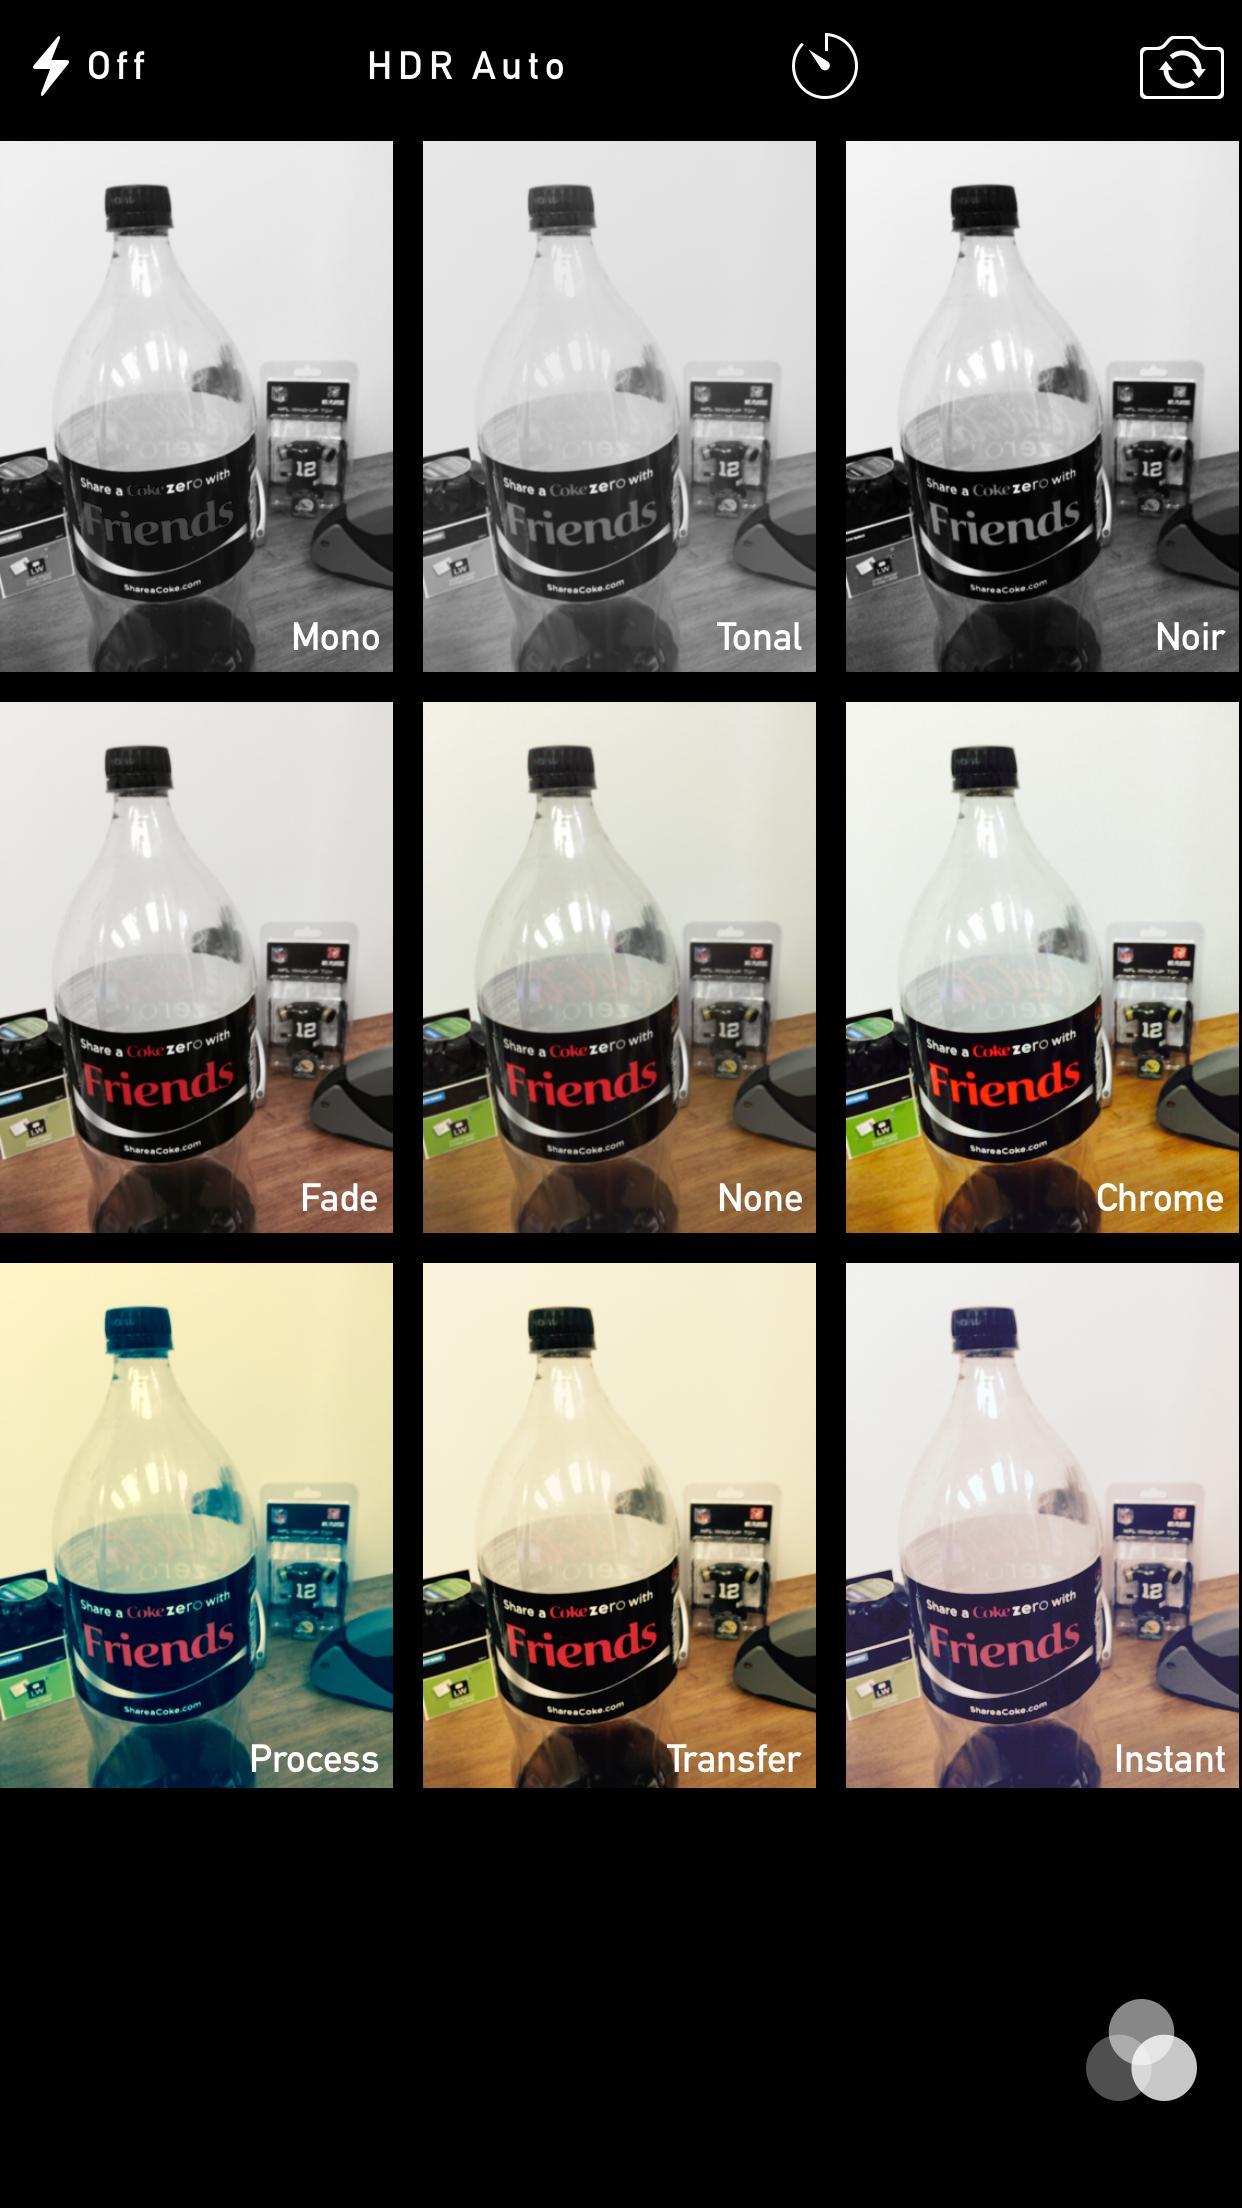 iphone 6 plus camera live filters